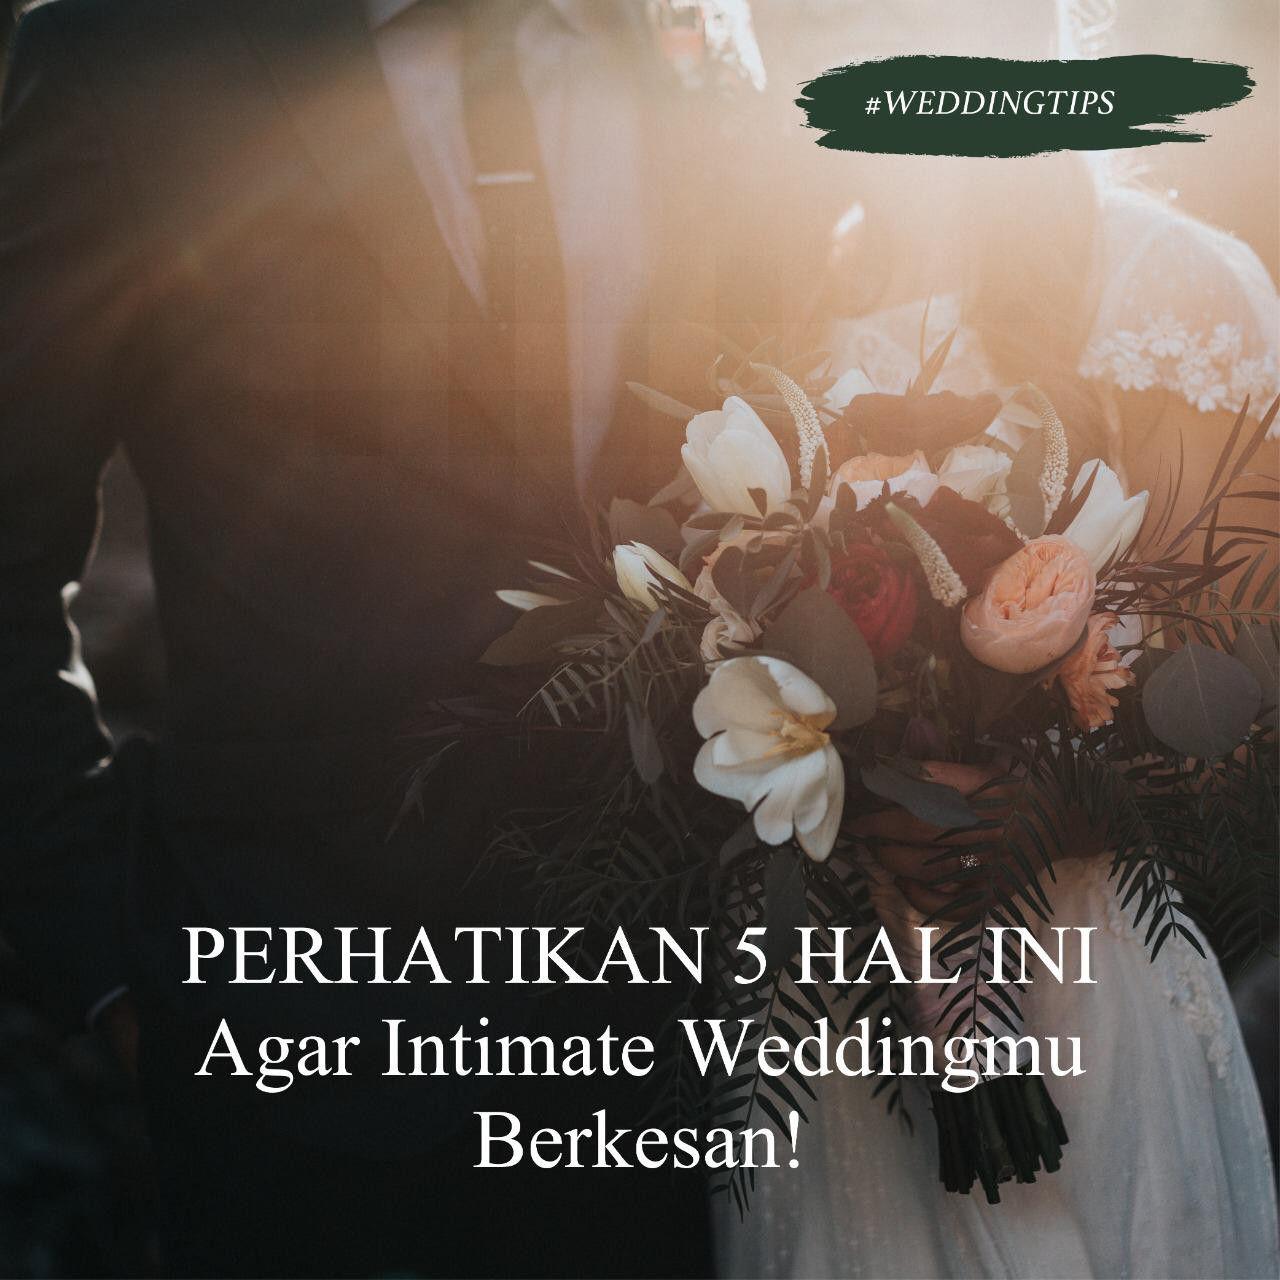 Perhatikan 5 Hal Ini Agar Intimate Weddingmu Berkesan!